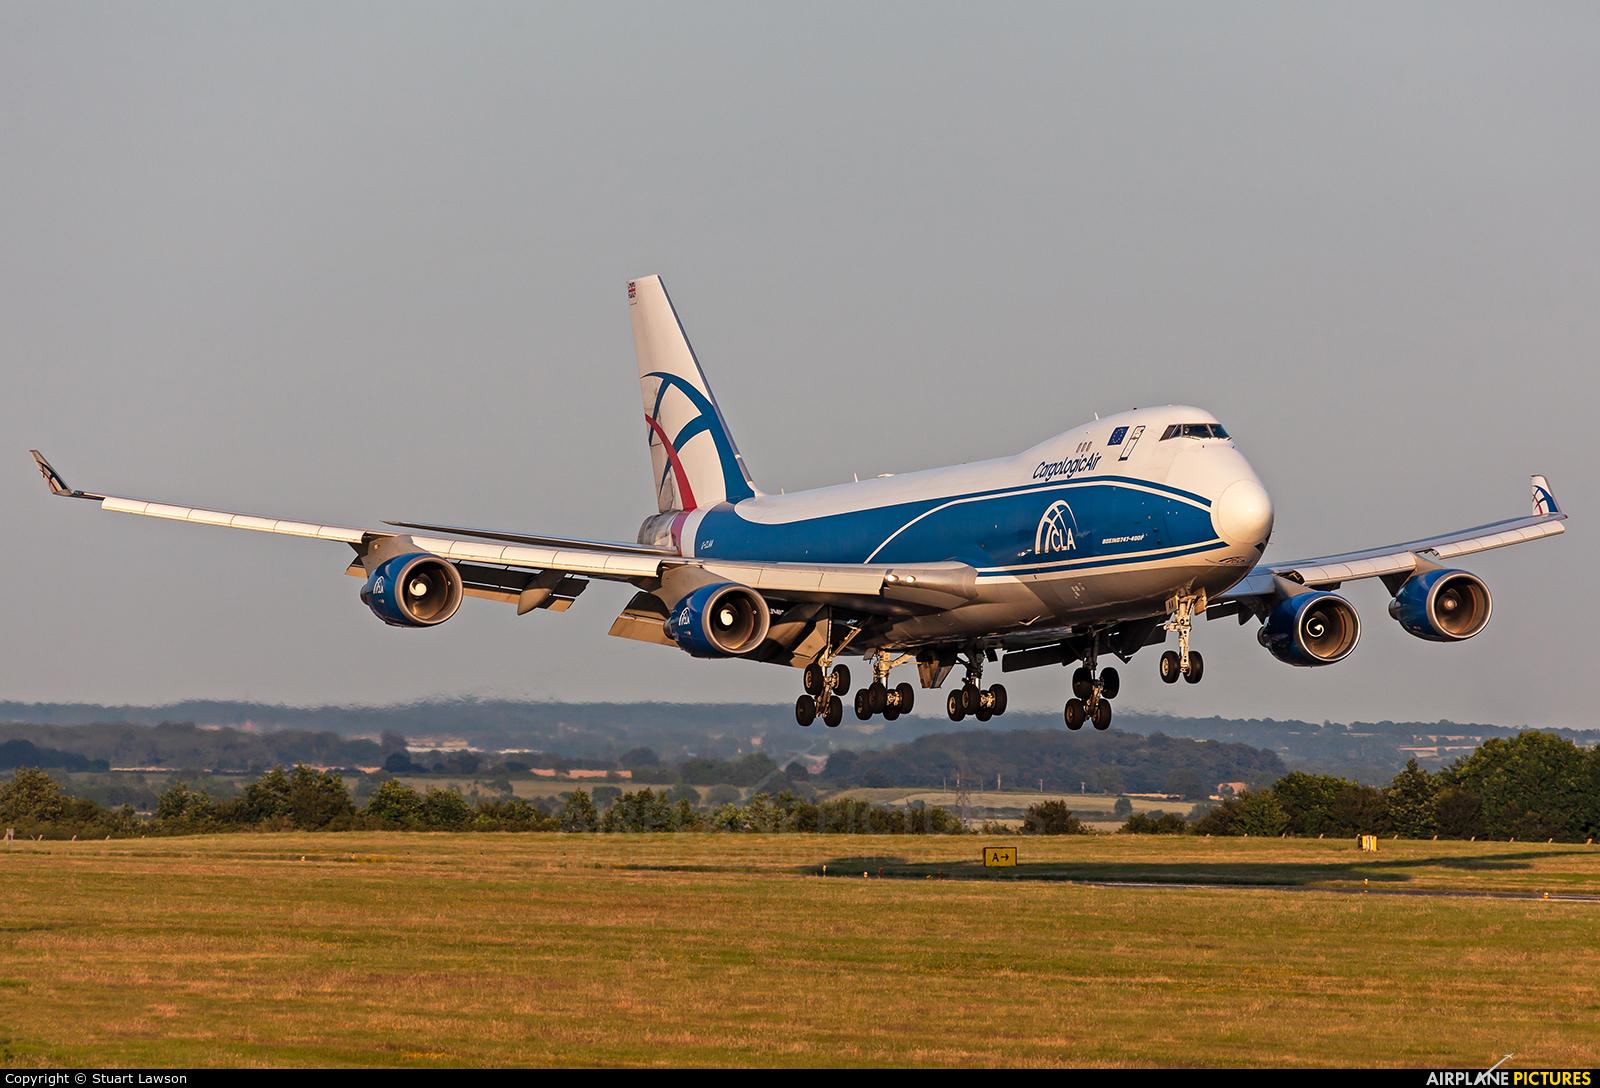 Cargologicair G-CLAA aircraft at East Midlands